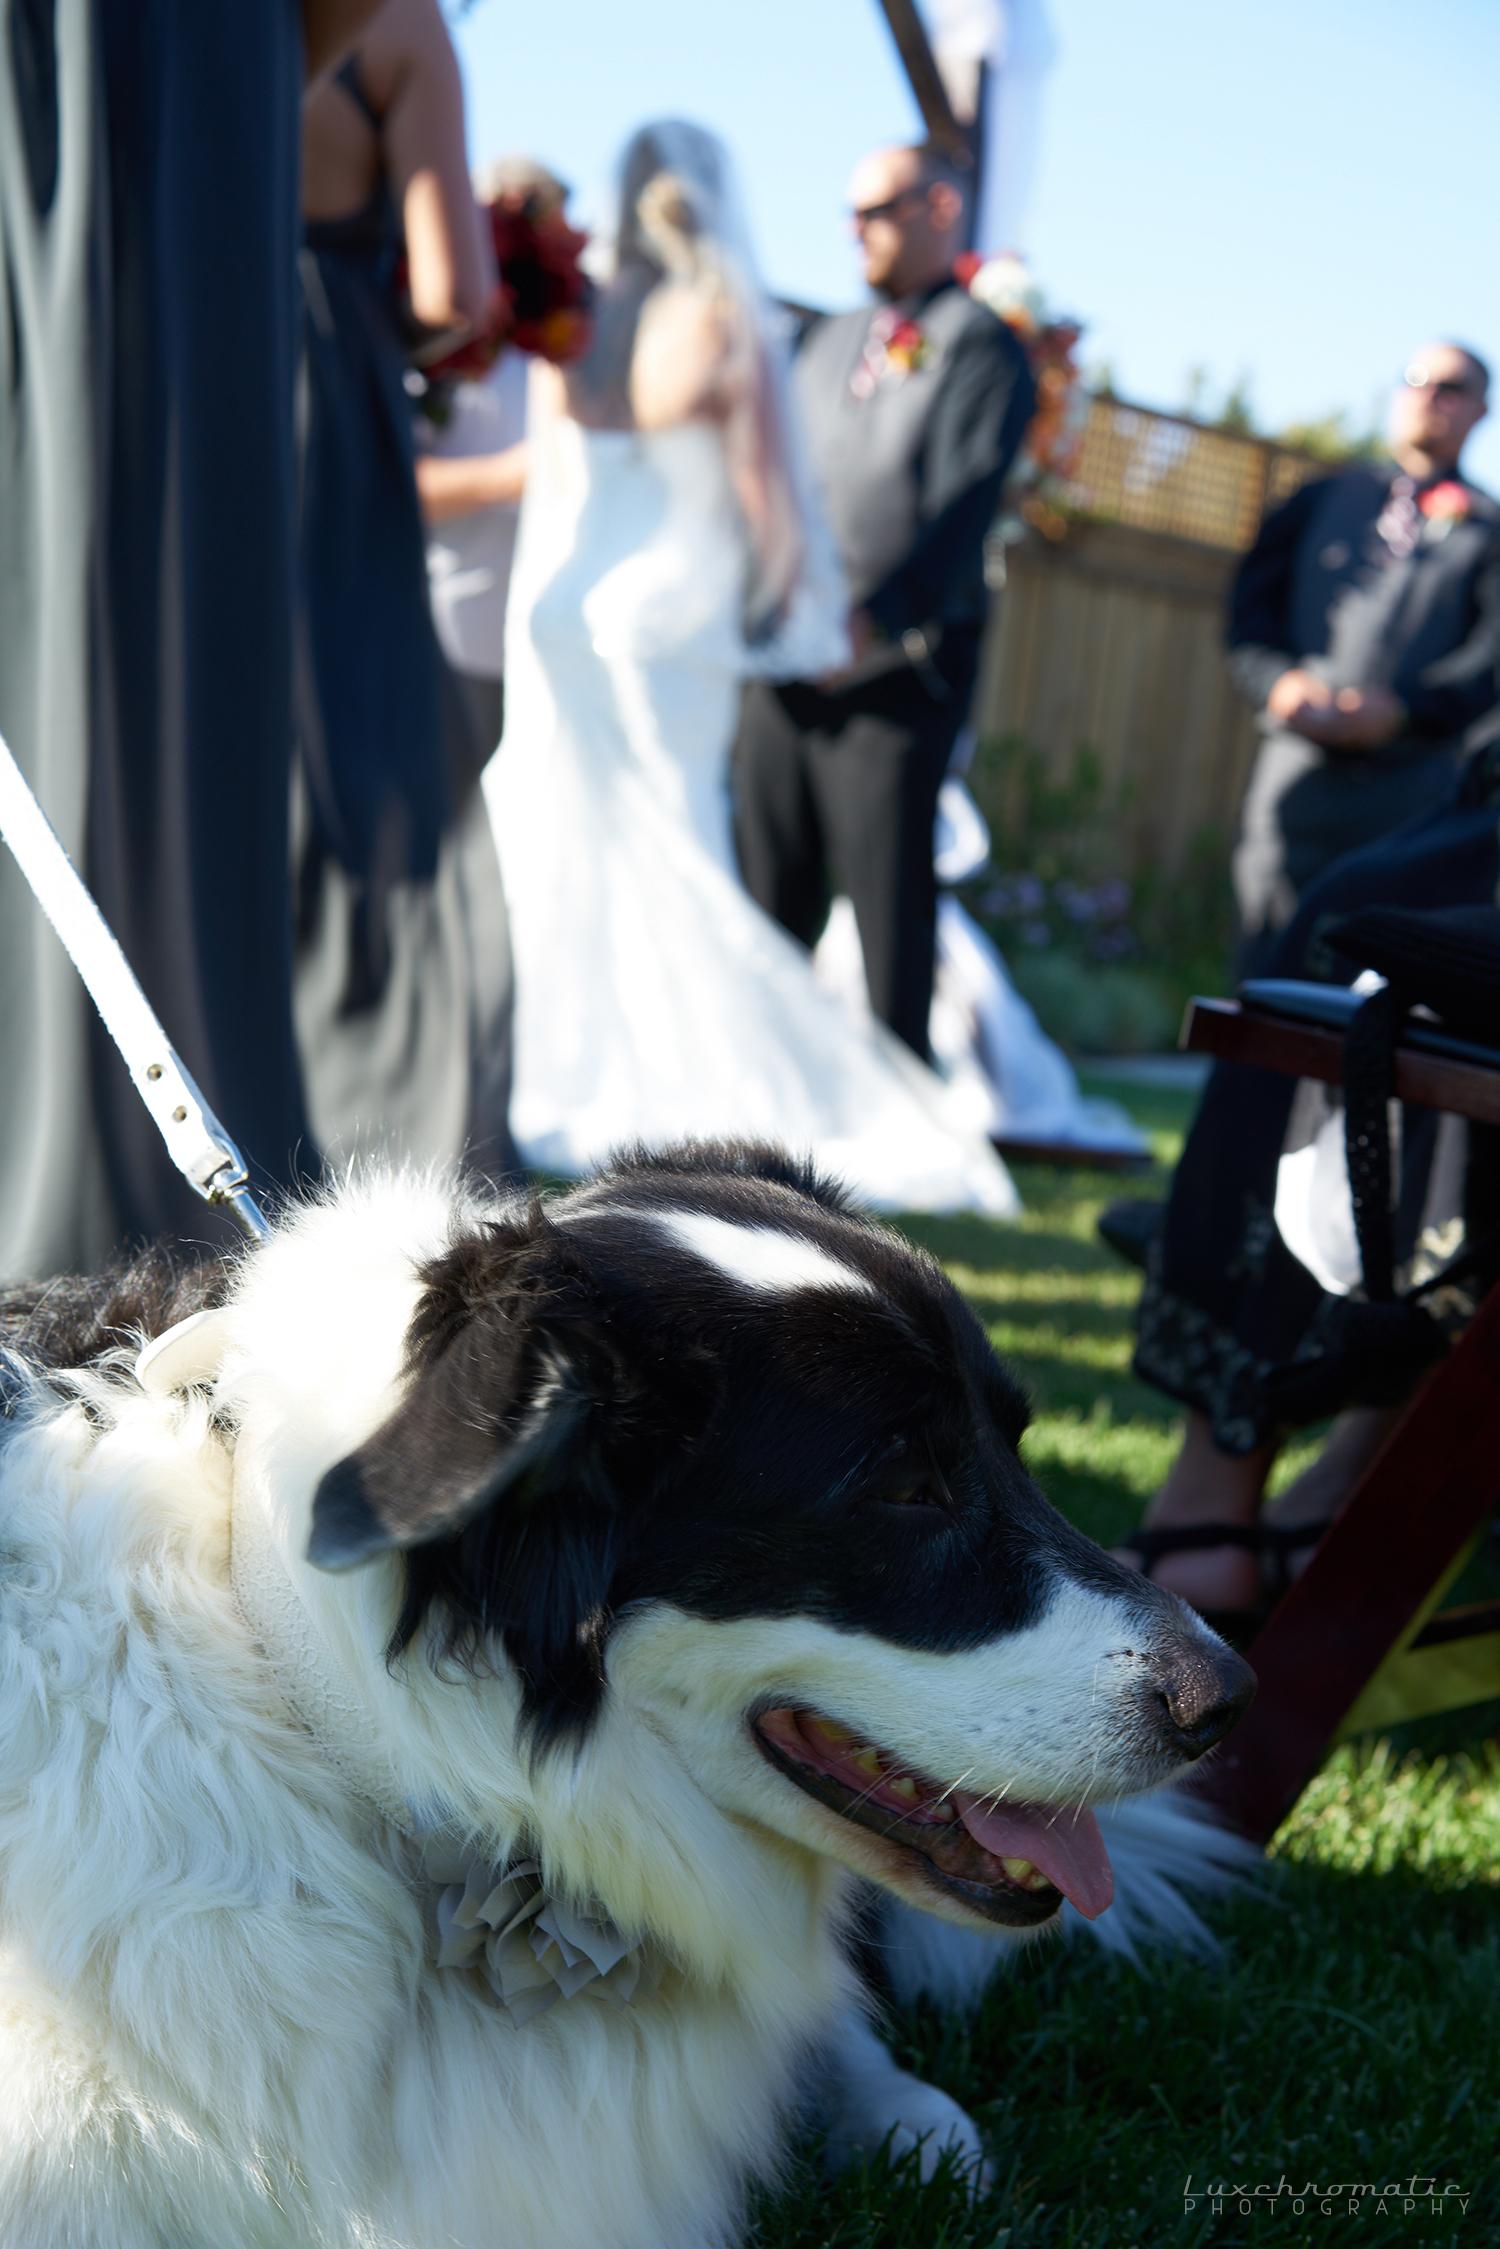 081217_Rachel_Chris_a0440-weddingdress-bride-weddingphotography-weddingphotographer-bridal-groom-wedding-engagementring-proposal-brides-diamondring-sonyalpha-sony-sonya9-sonya7rii-sanfrancisco-sf-bayarea-photographer-profoto-murrietas-well.jpg